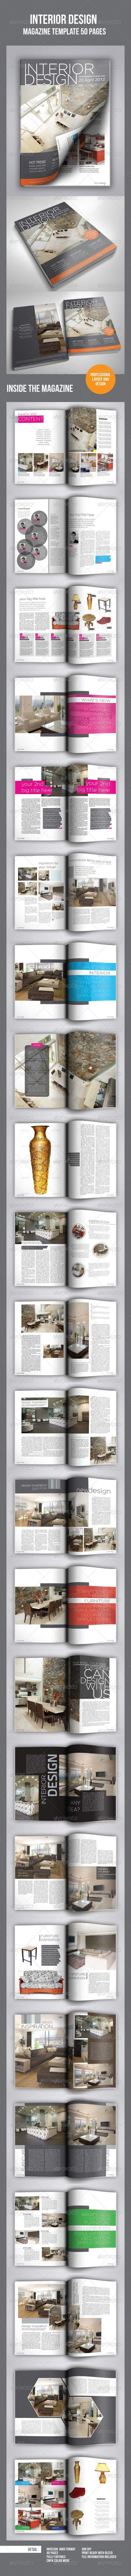 30 best Editorial/Magazine Template images on Pinterest | Magazine ...